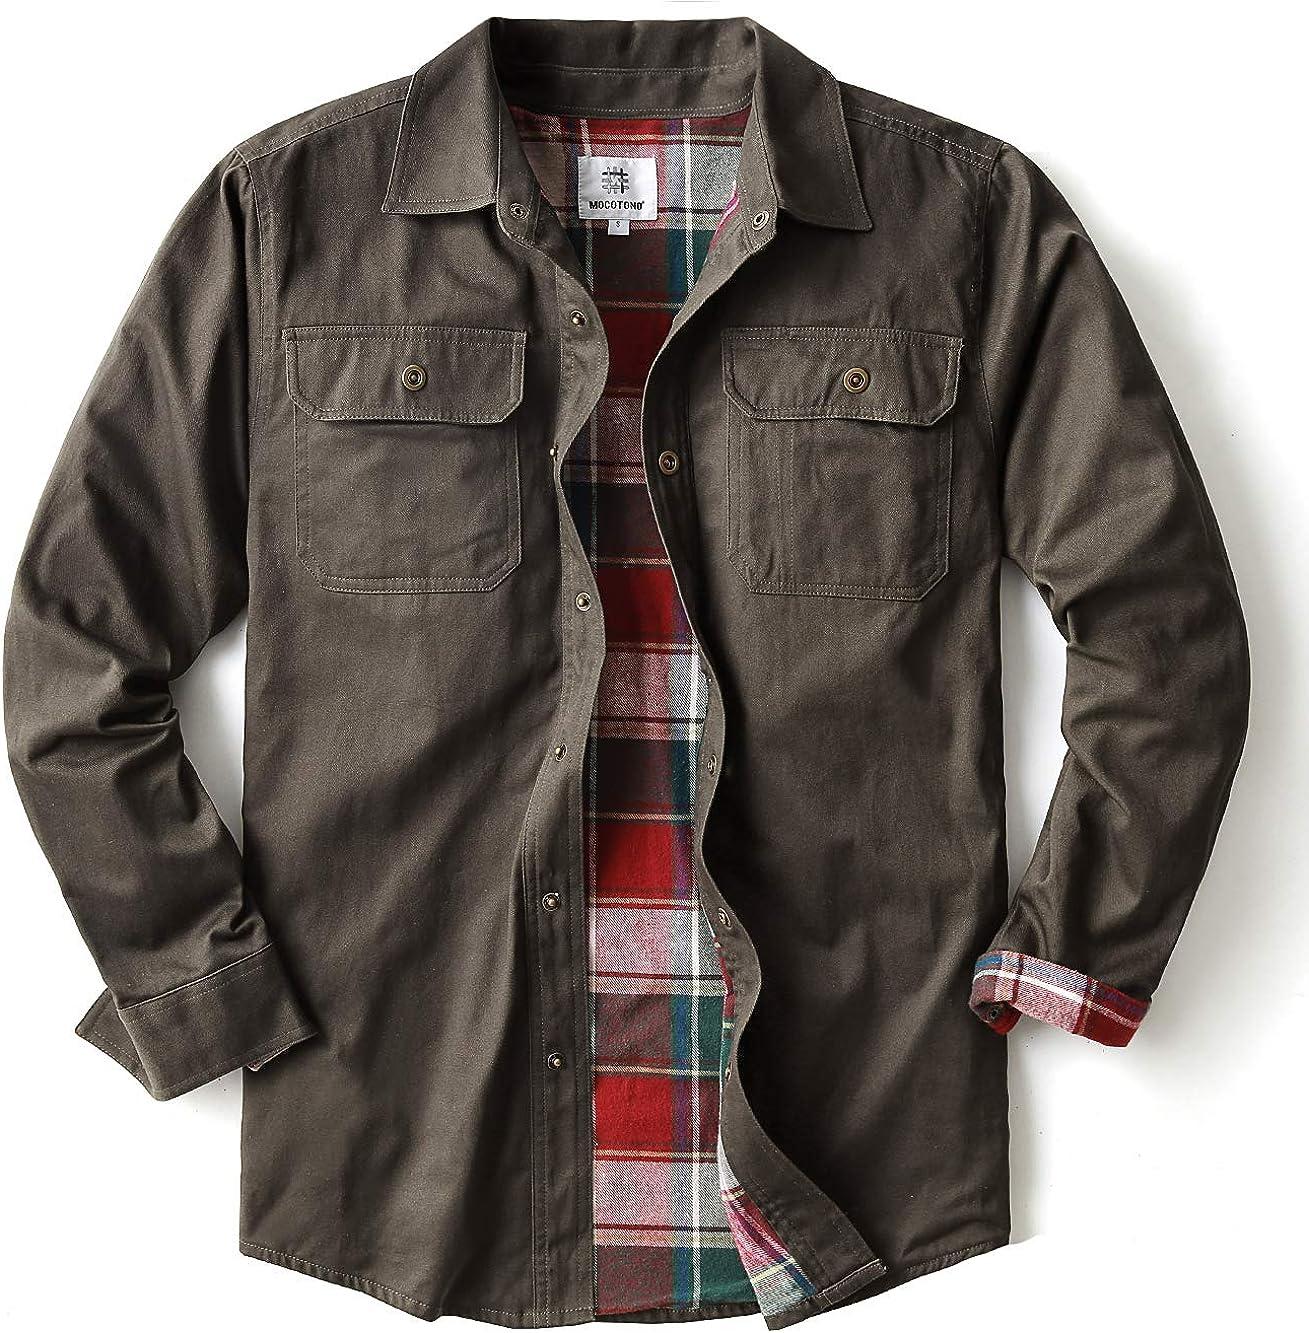 MOCOTONO Mens Heavyweight Cotton Canvas Flannel Lined Shirt Jacket